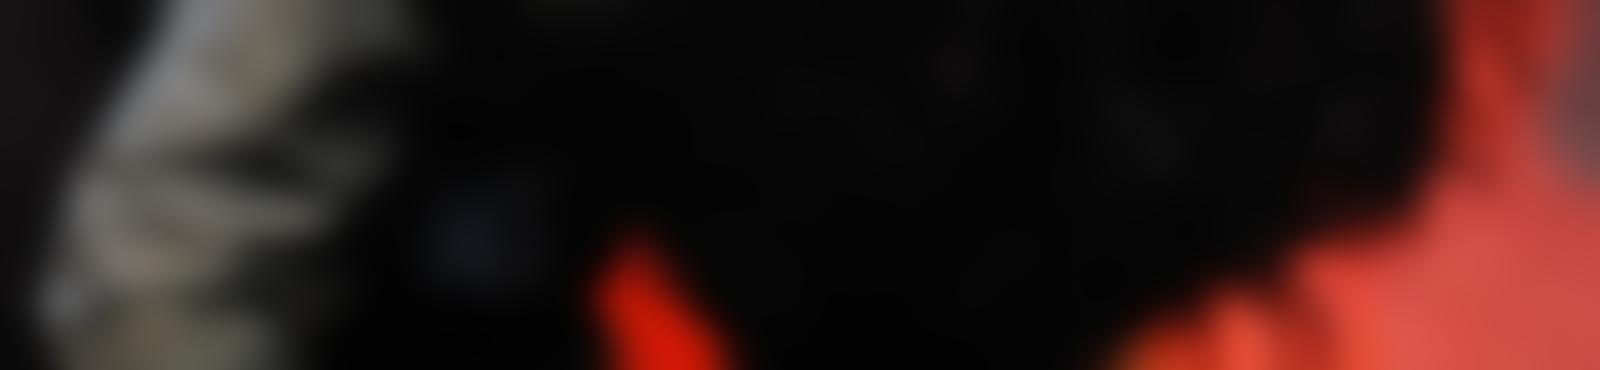 Blurred 4a6bcd76 627d 47ff a41b b216d01330ff